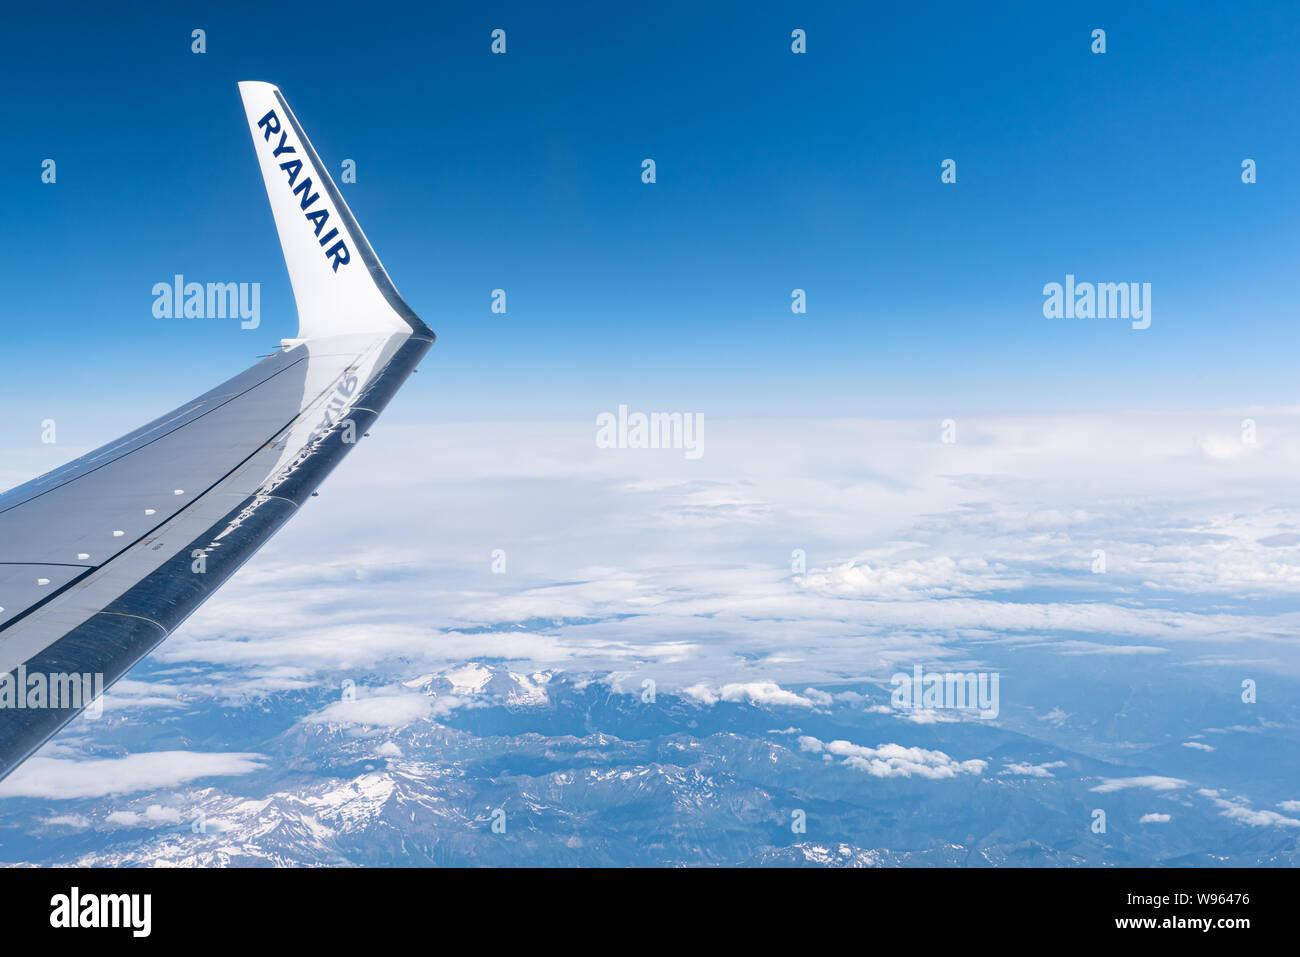 Austria - 07 July, 2019: Flight Palma de Mallorca, Spain - Krakow, Poland. Ryanair airplane wing on sky background. Above the Alps mountains. Stock Photo